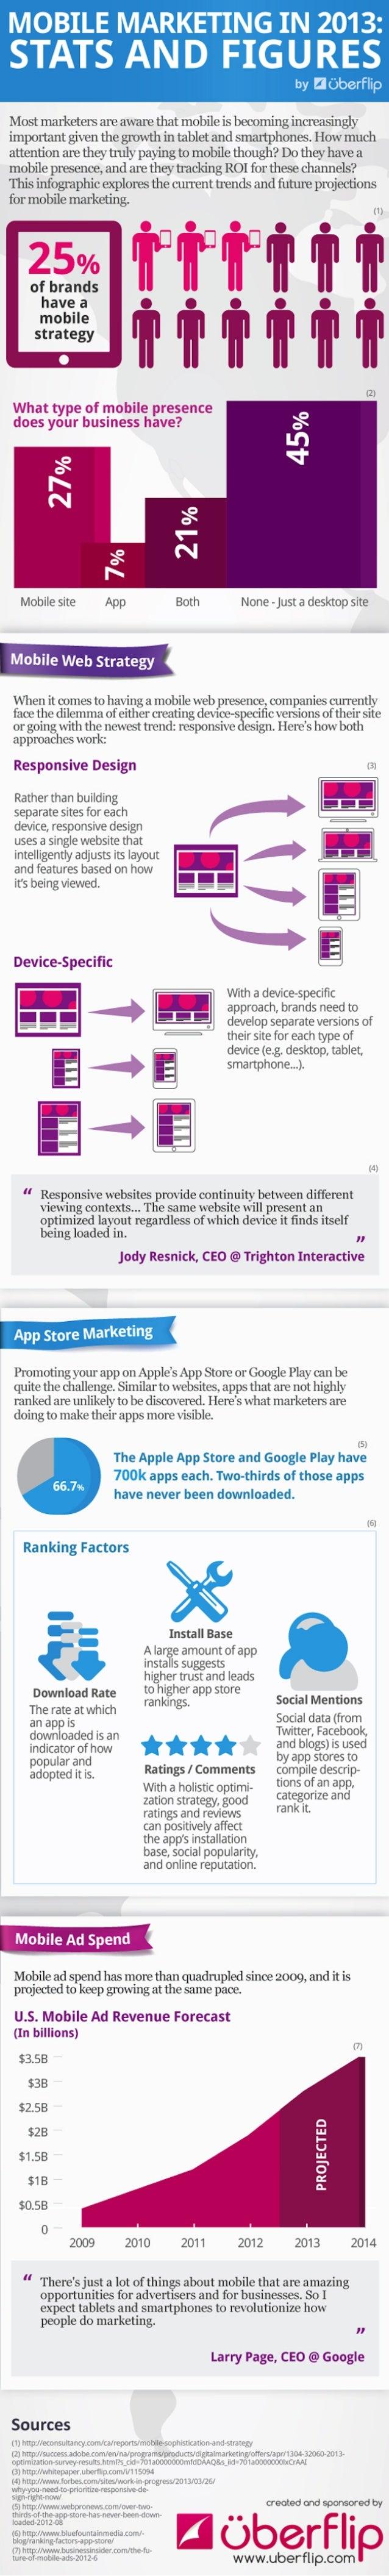 Mobile Marketing 2013